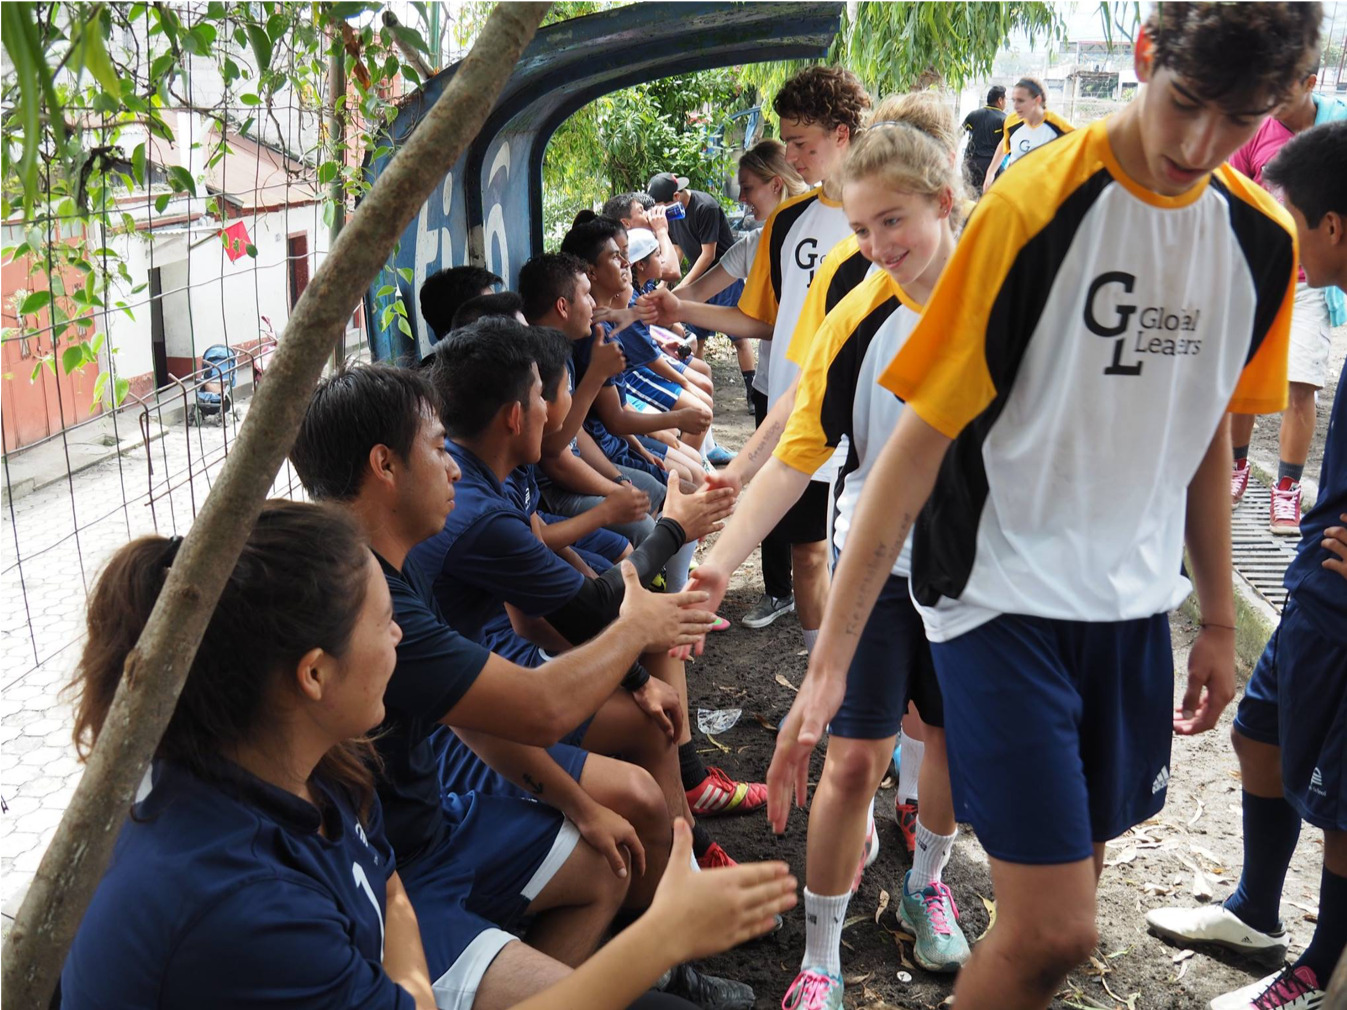 Global Leaders annual soccer game in Guatemala